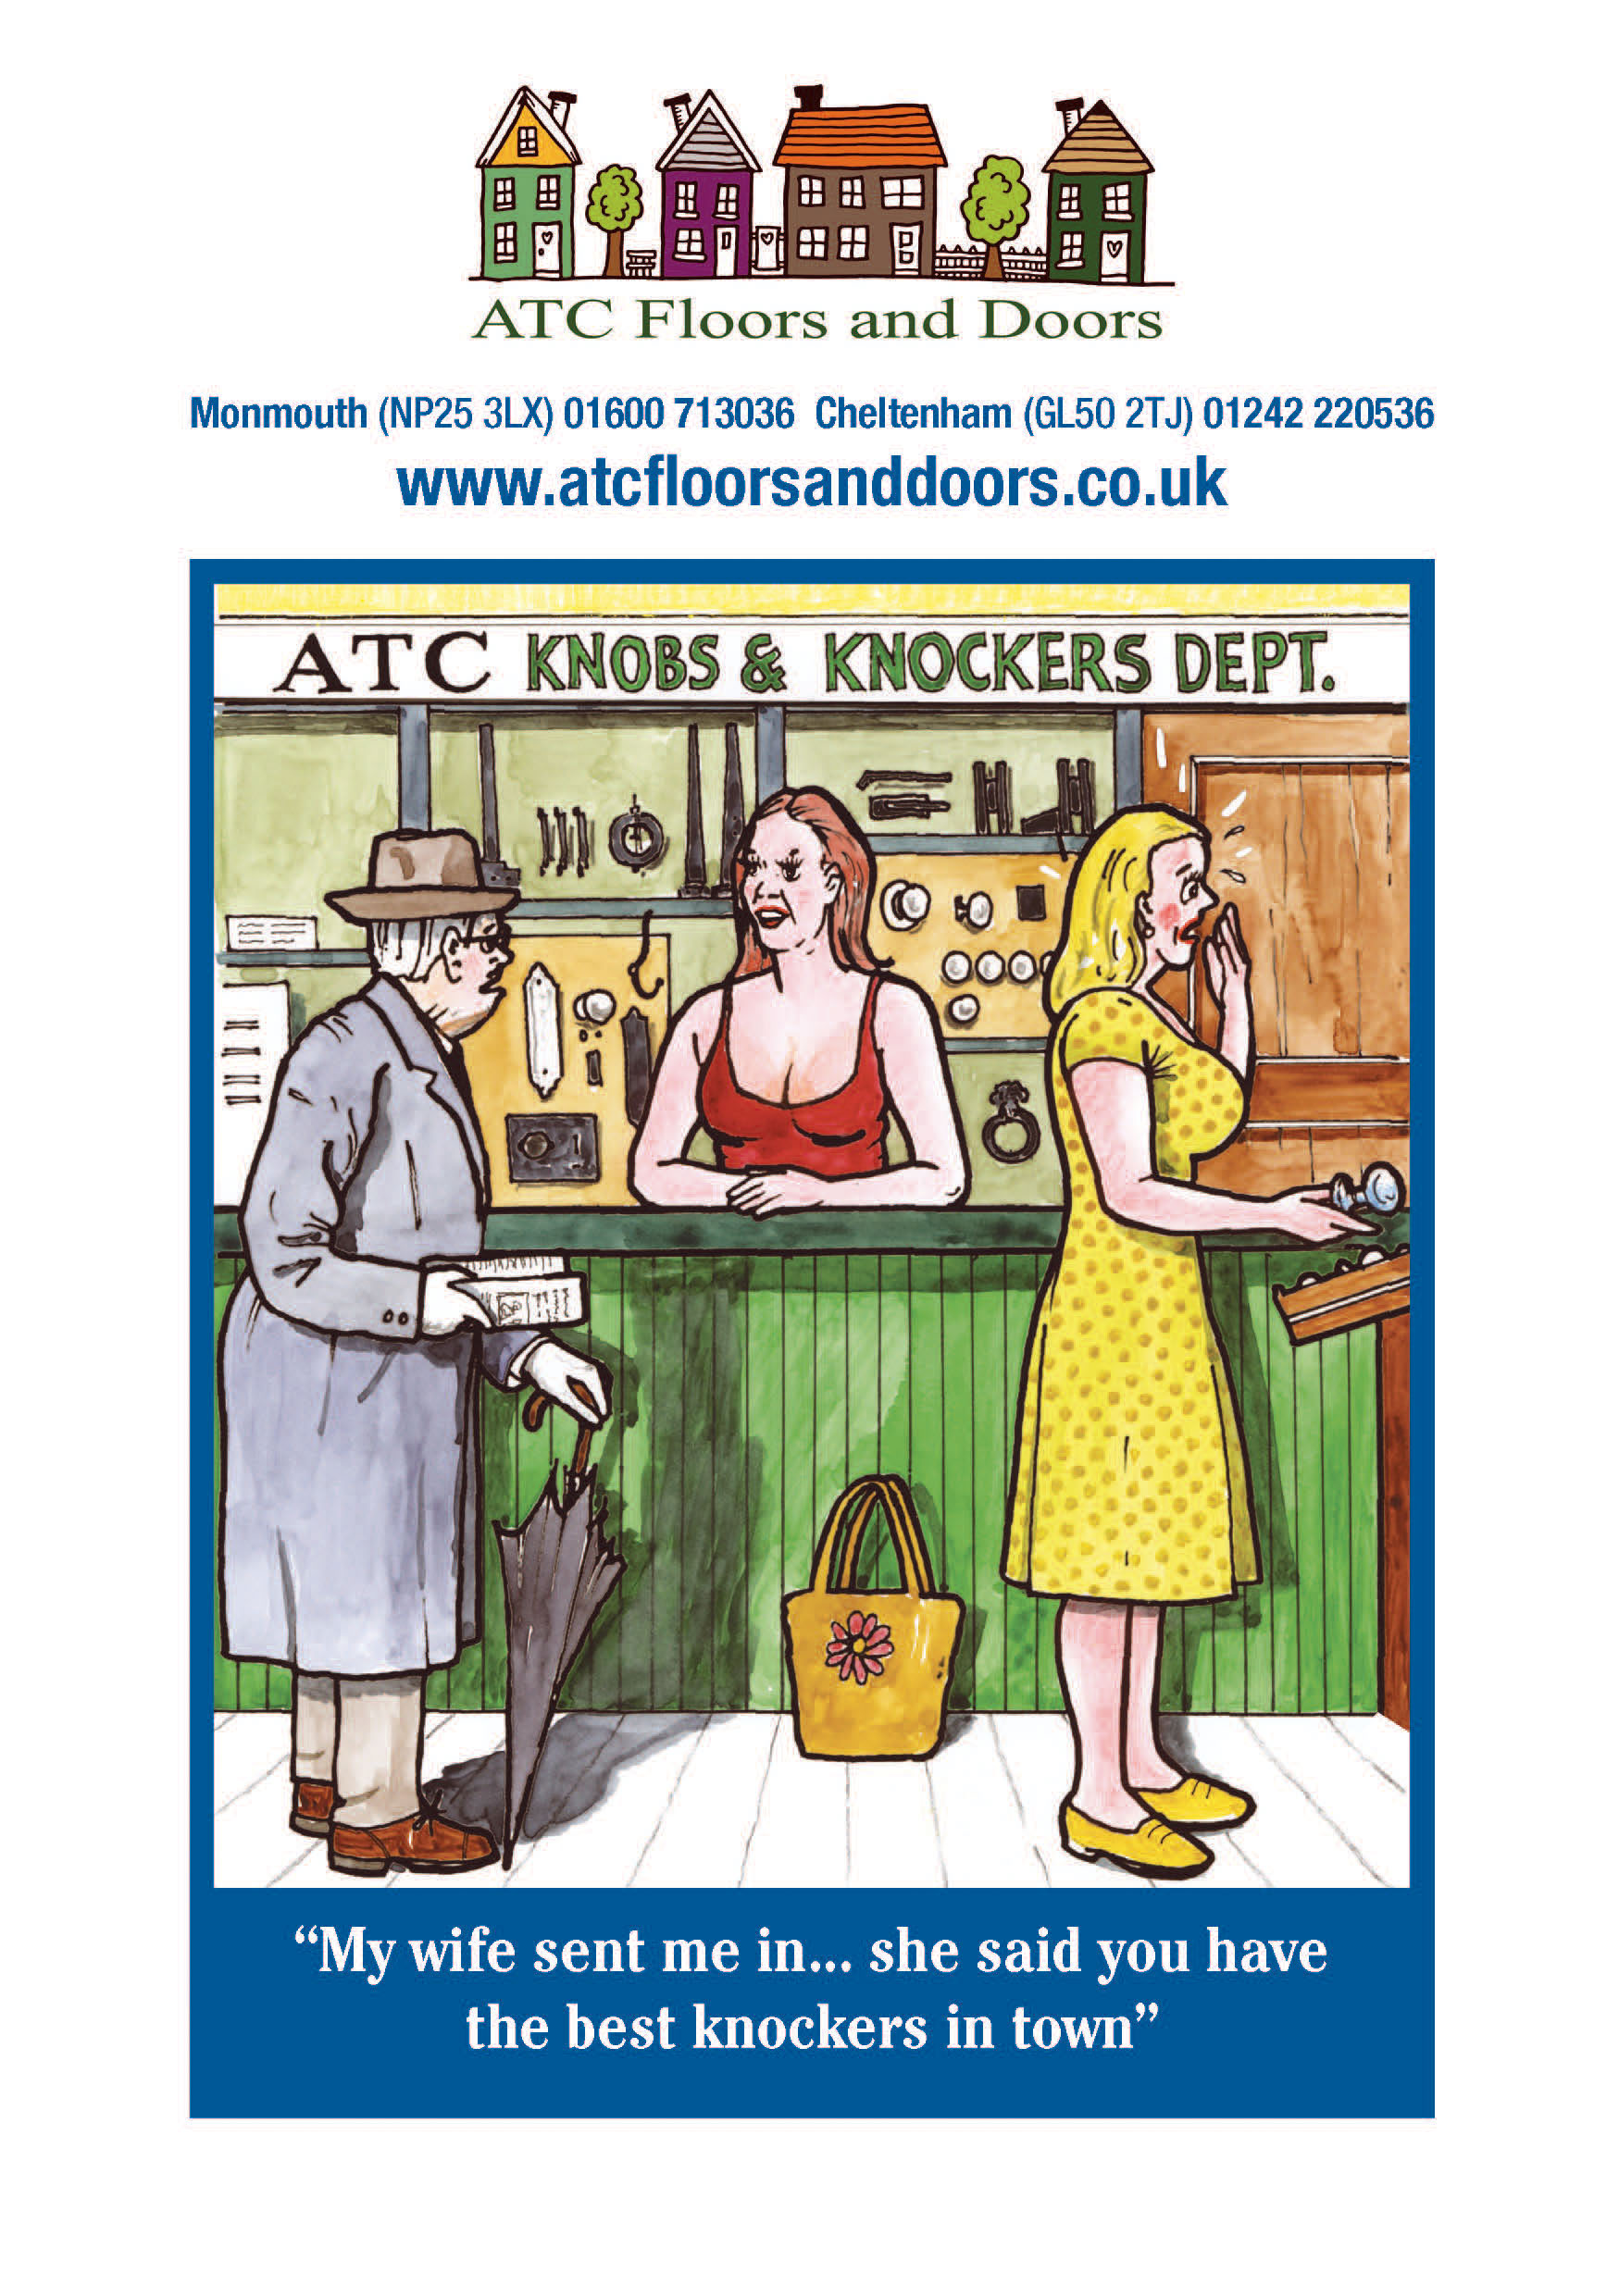 ATC 'Knobs and Knockers' Advert